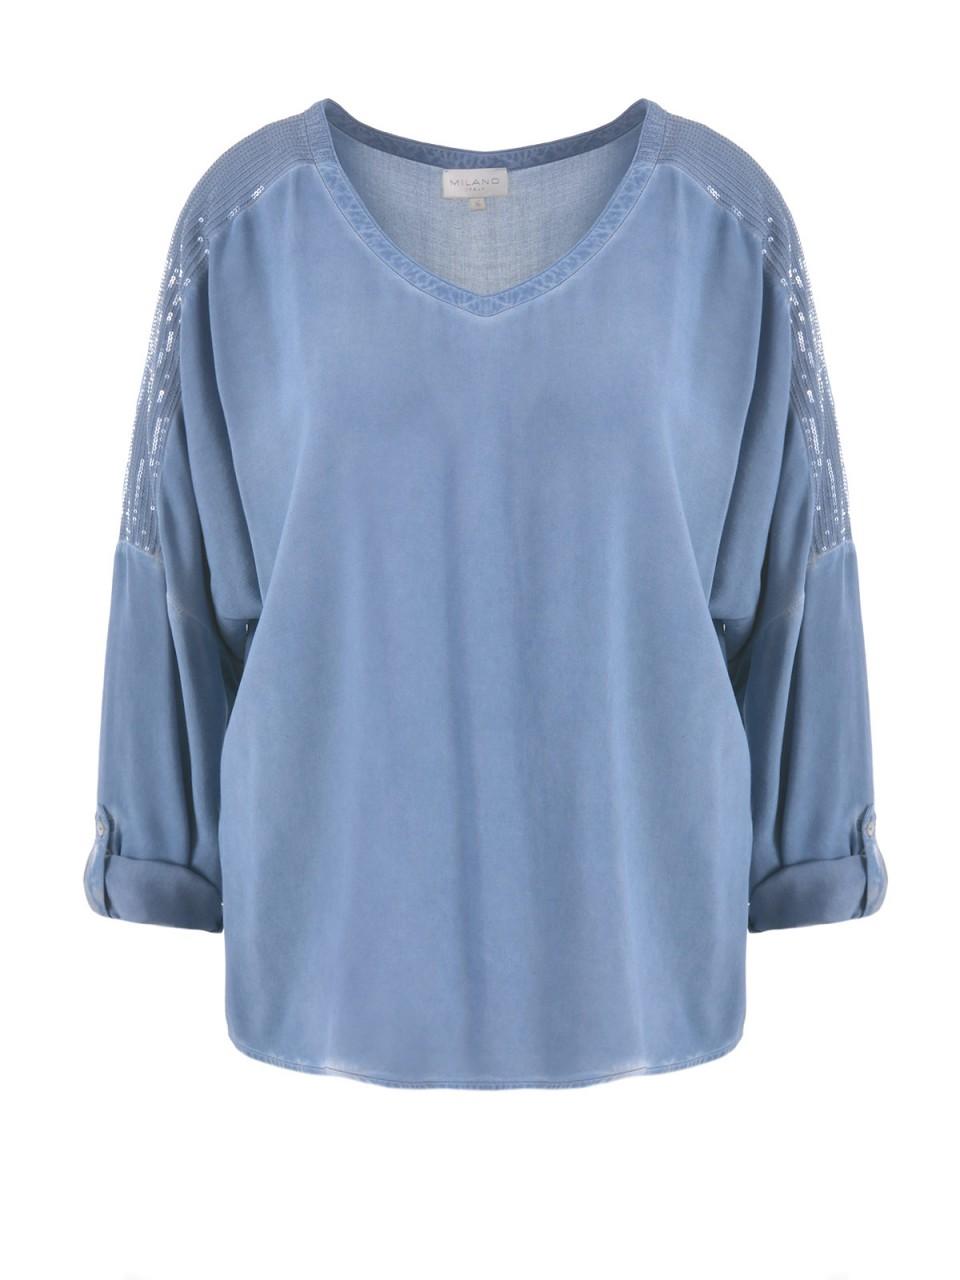 milano-italy-damen-bluse-blau